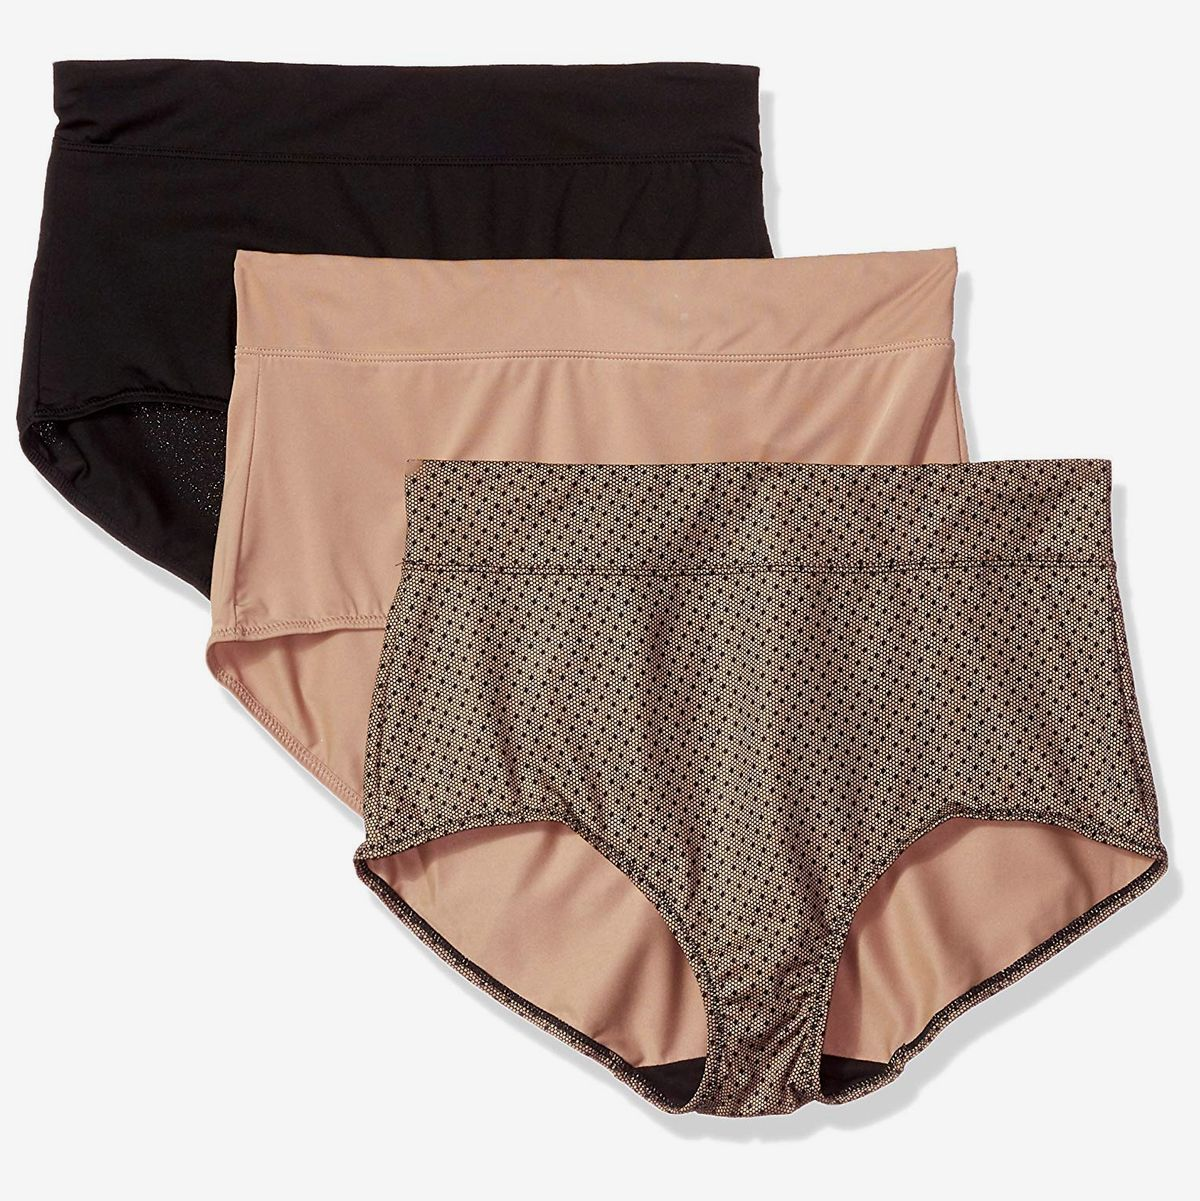 Lernonl No Ride Up Low Rise Cotton Brief Panties Women Seamless Underwear 2 Pack